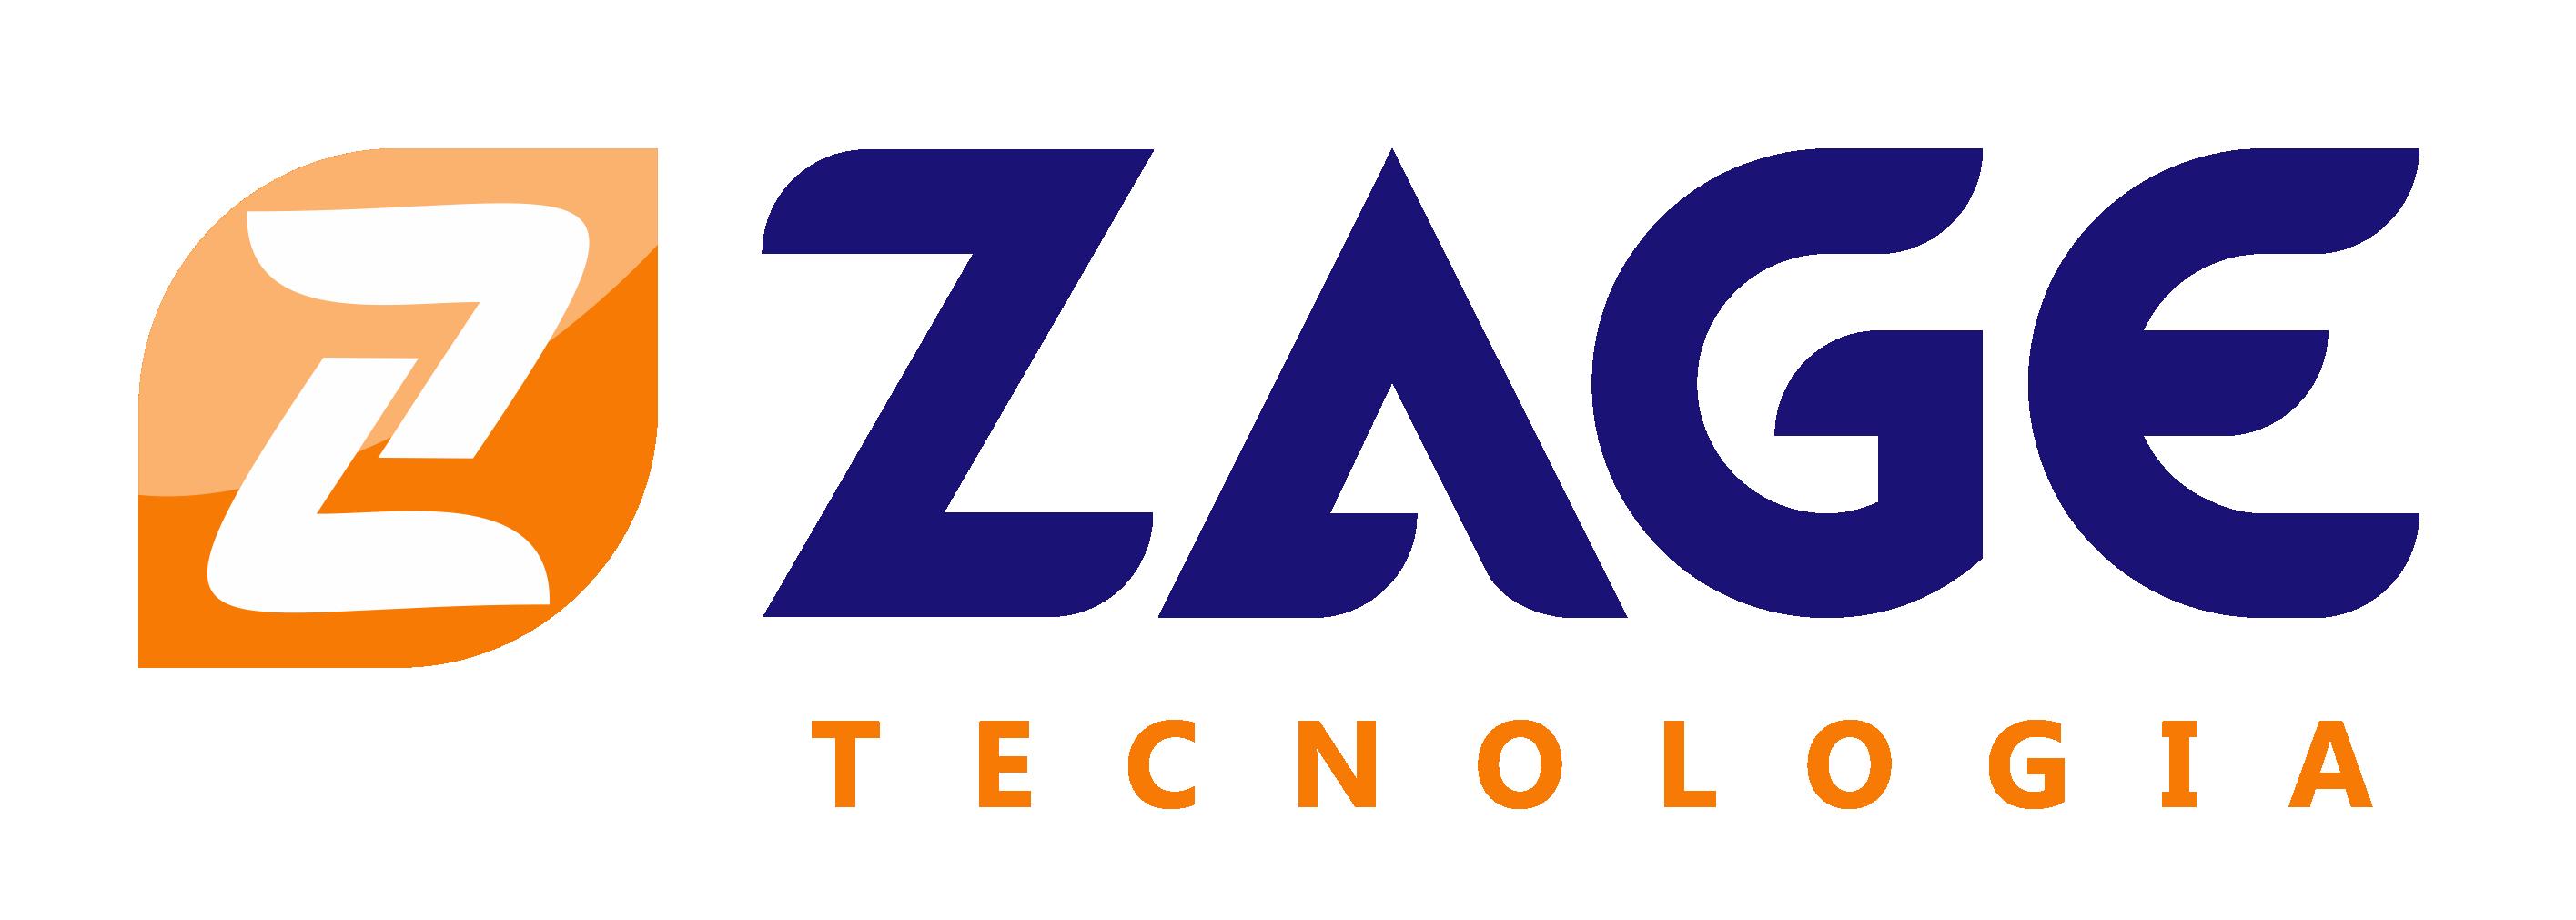 ZAGE TECNOLOGIA